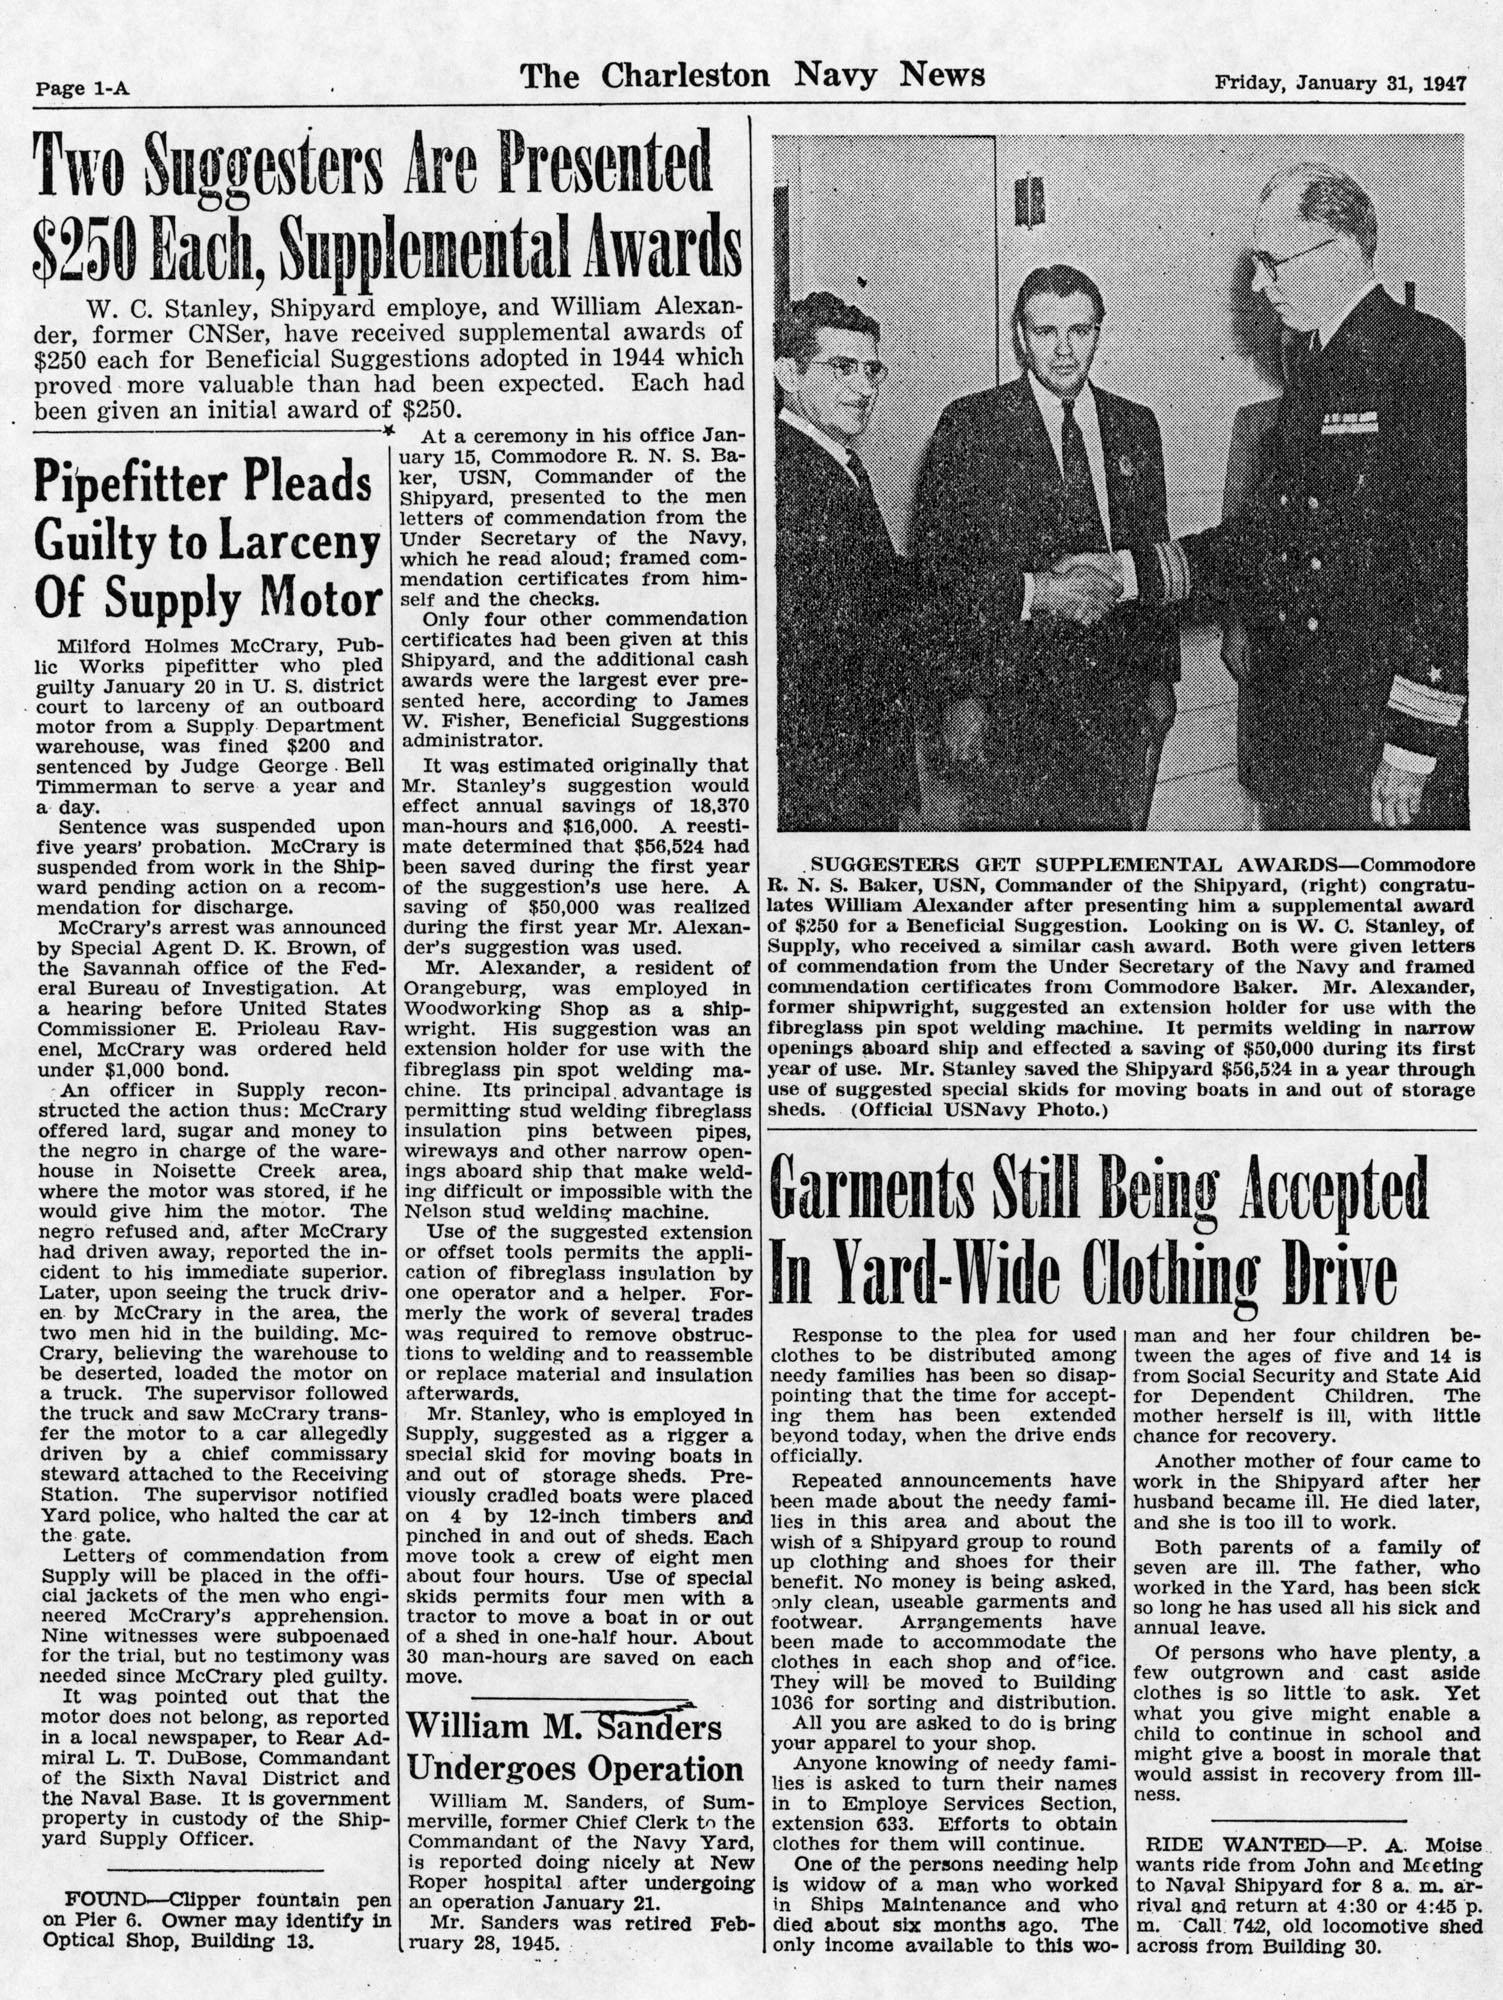 The Charleston Navy News, Volume 5, Edition 13, page ia